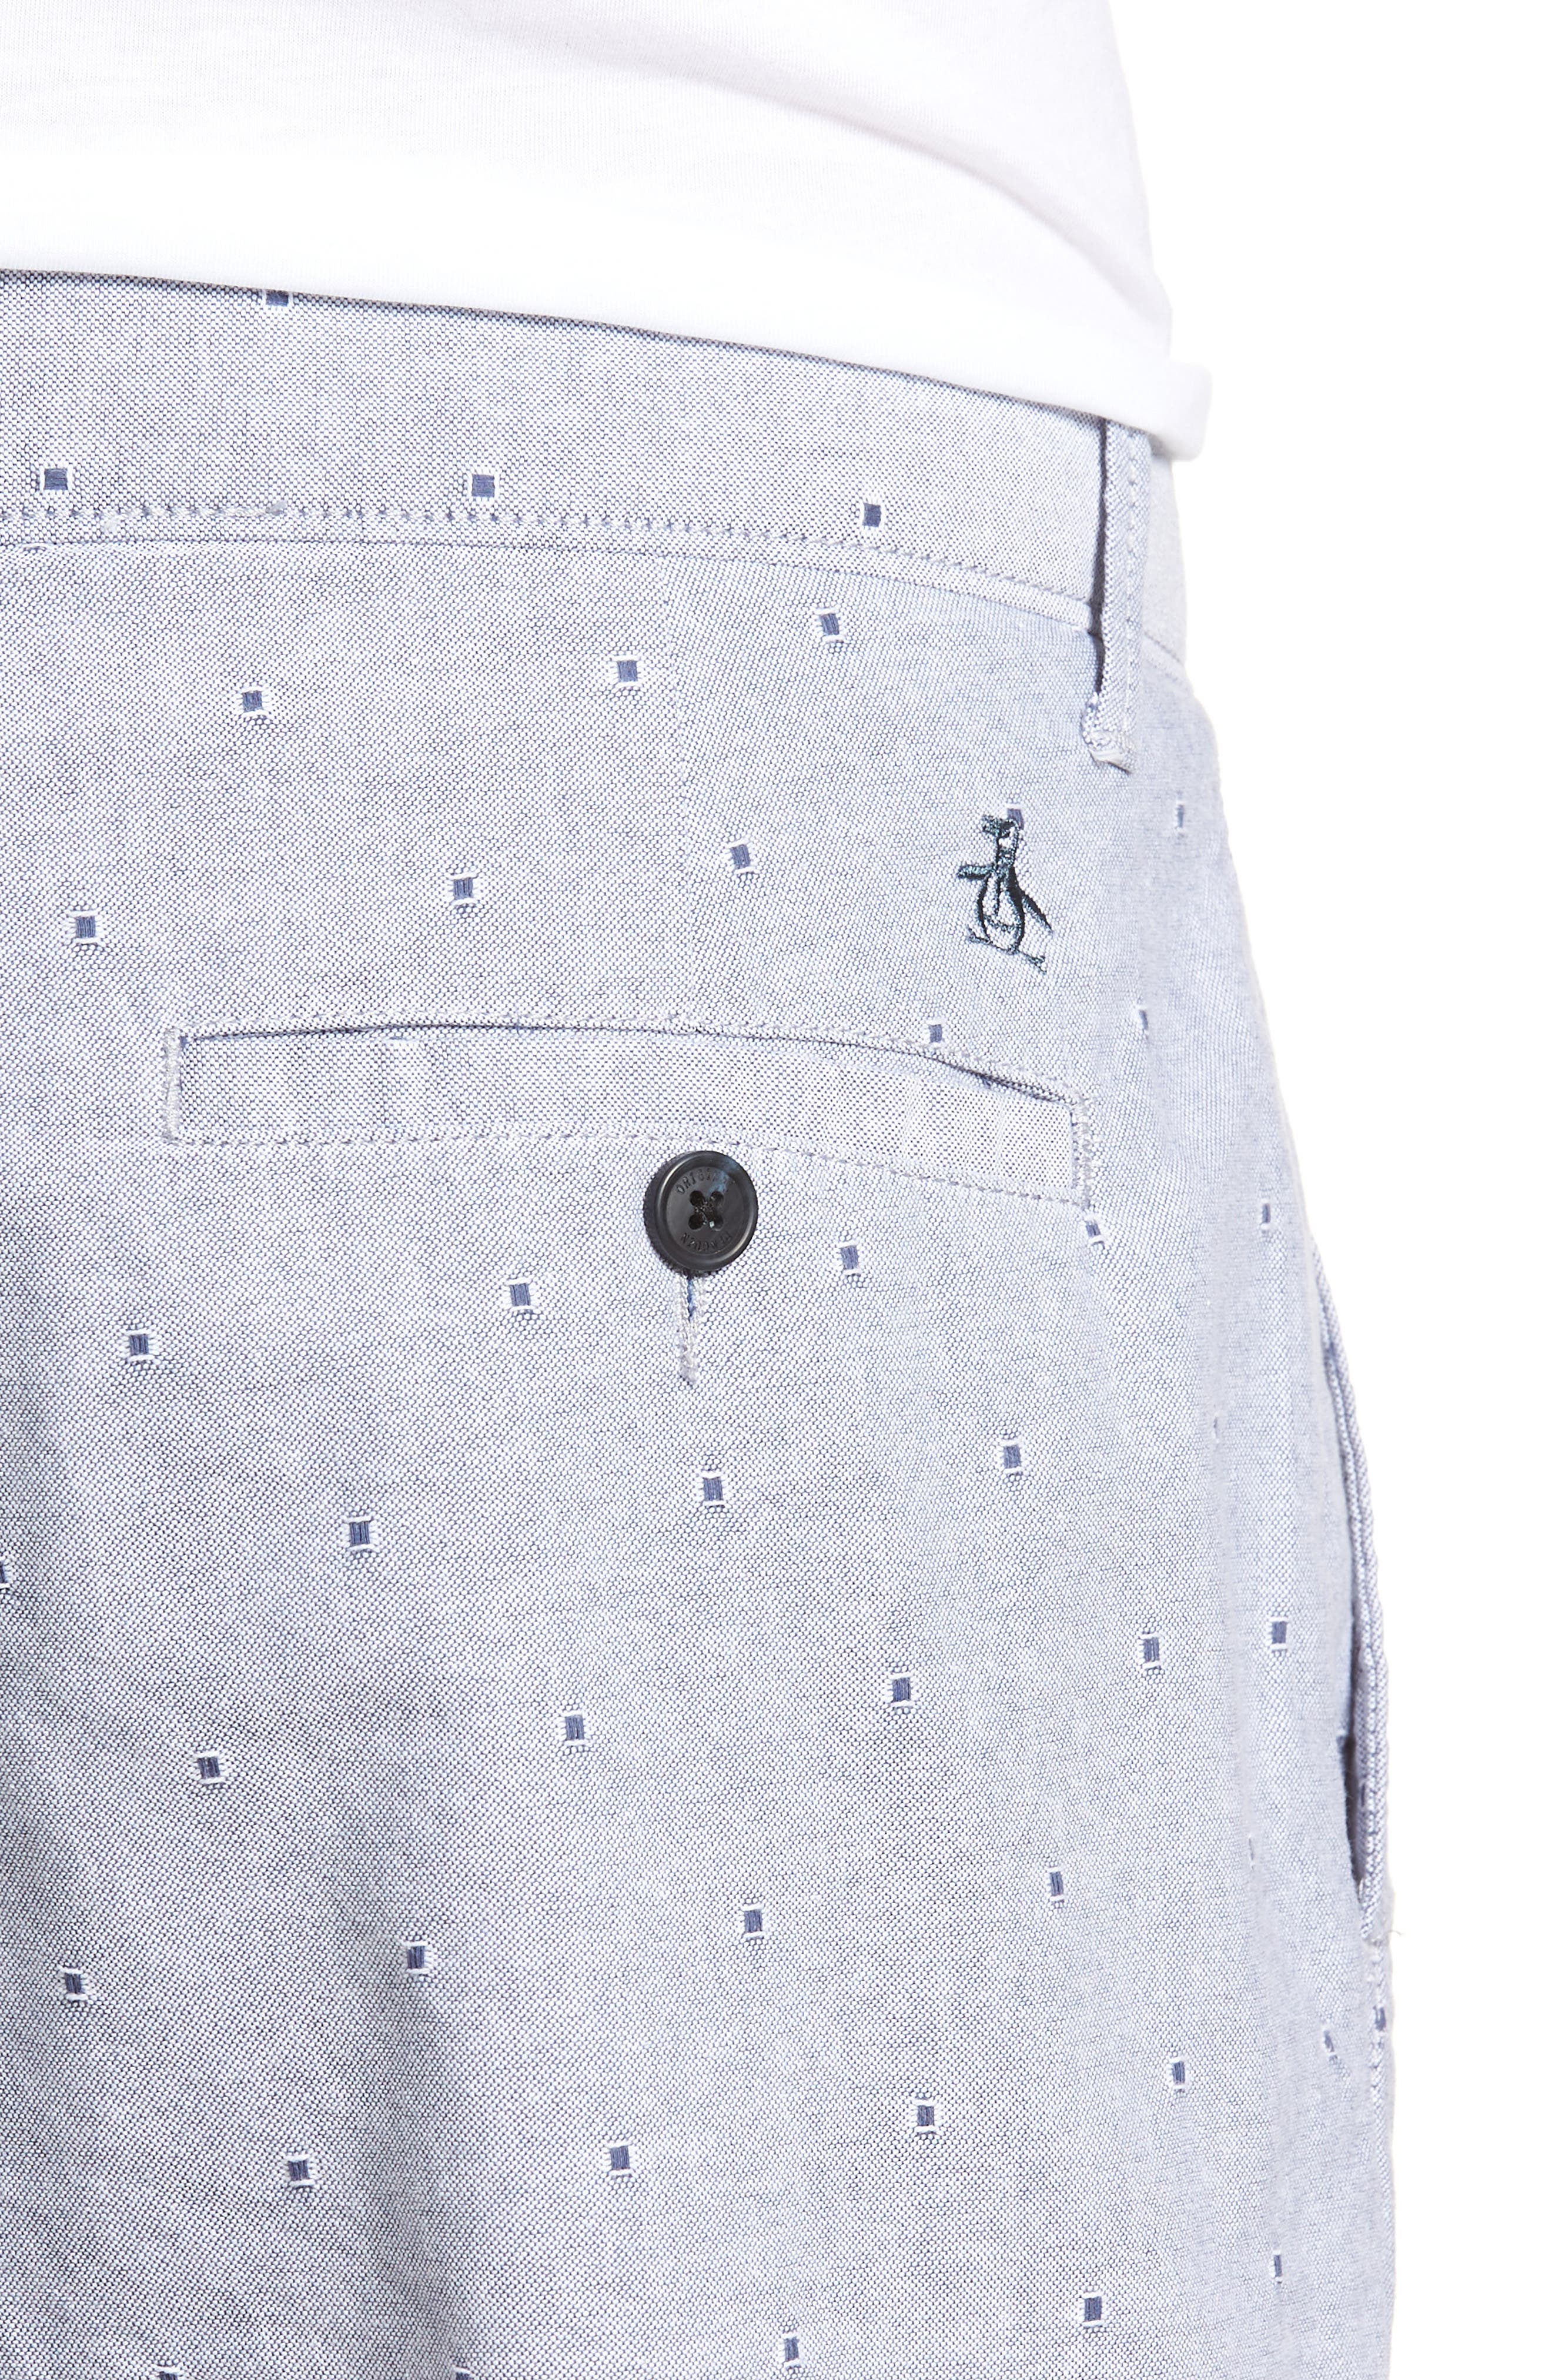 Dobby Dot Slim Fit Oxford Shorts,                             Alternate thumbnail 4, color,                             425